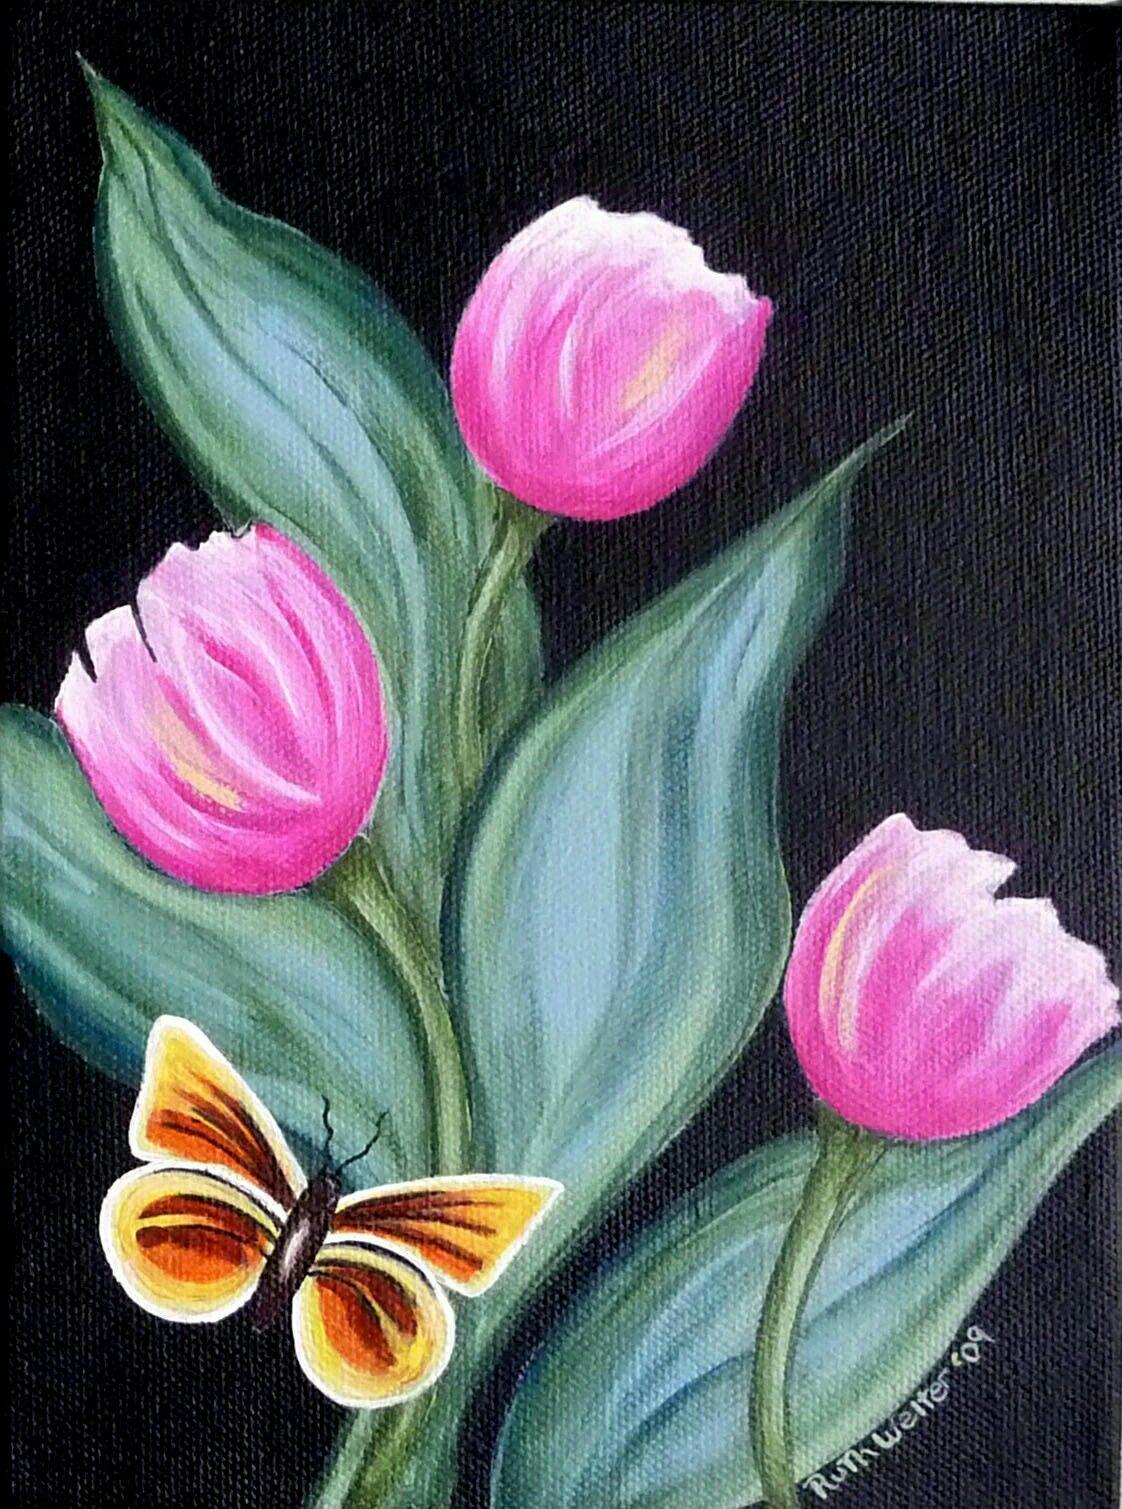 Flower Painting Canvas Image By Arzu Beyaz On Guzel Resimler